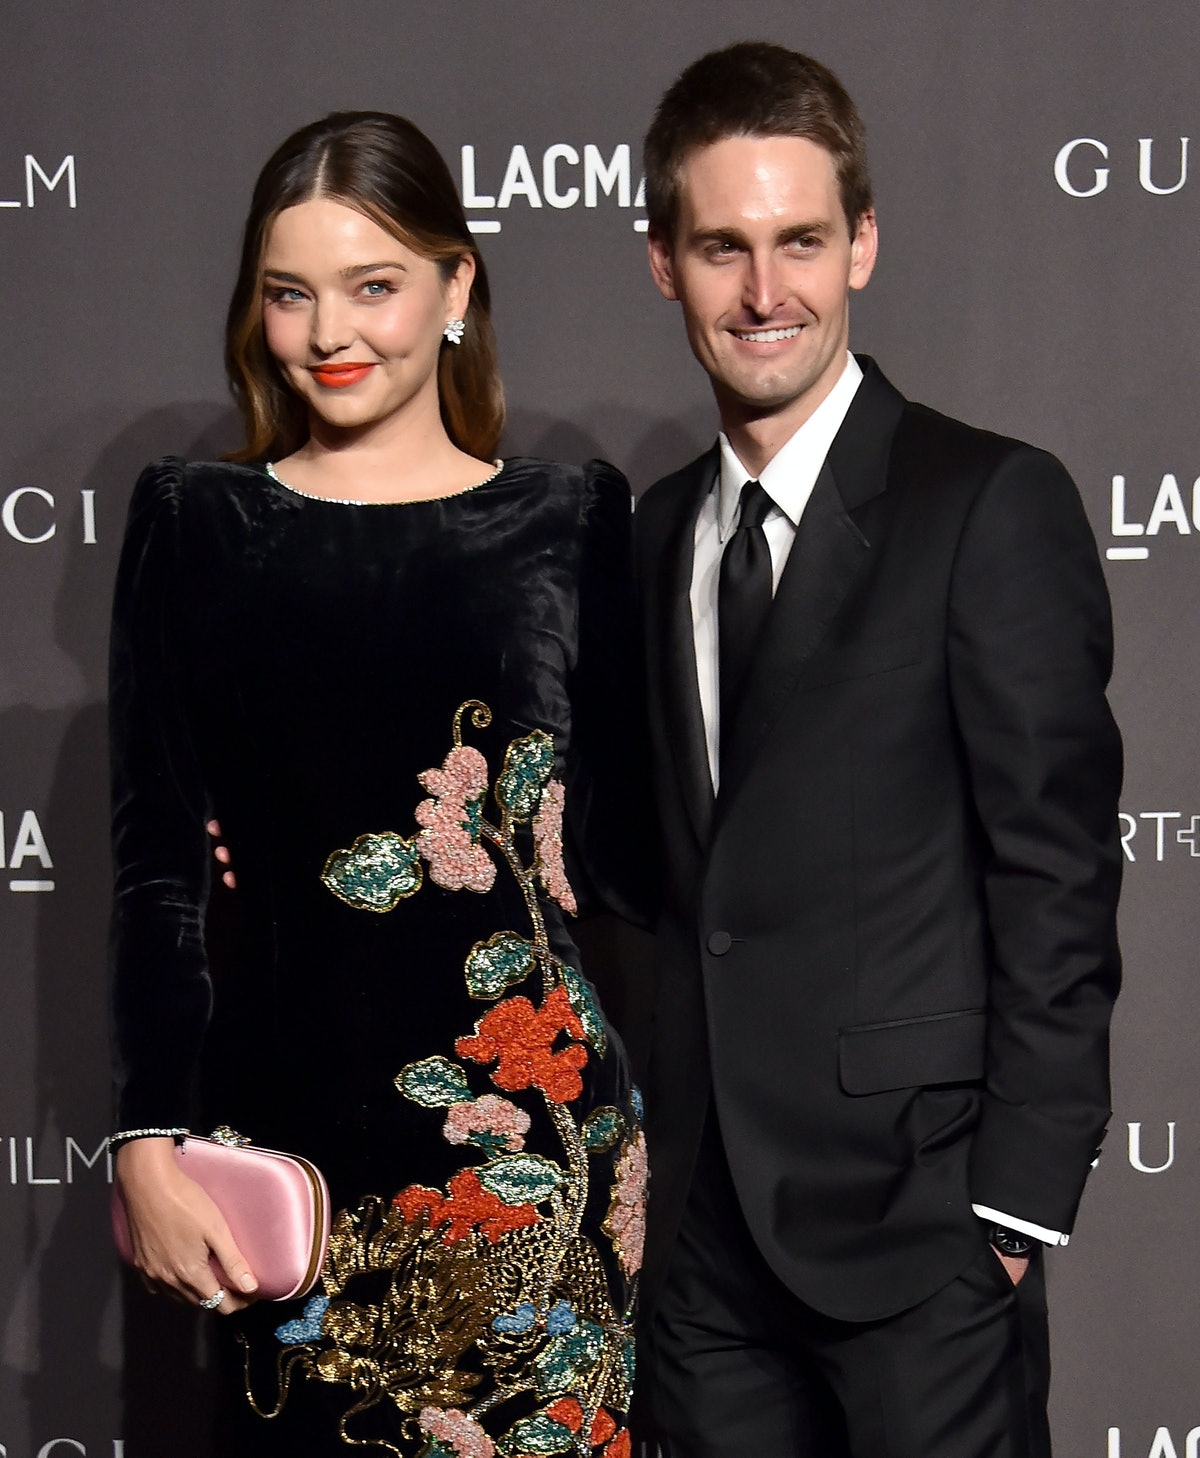 2018 LACMA Art + Film Gala - Arrivals